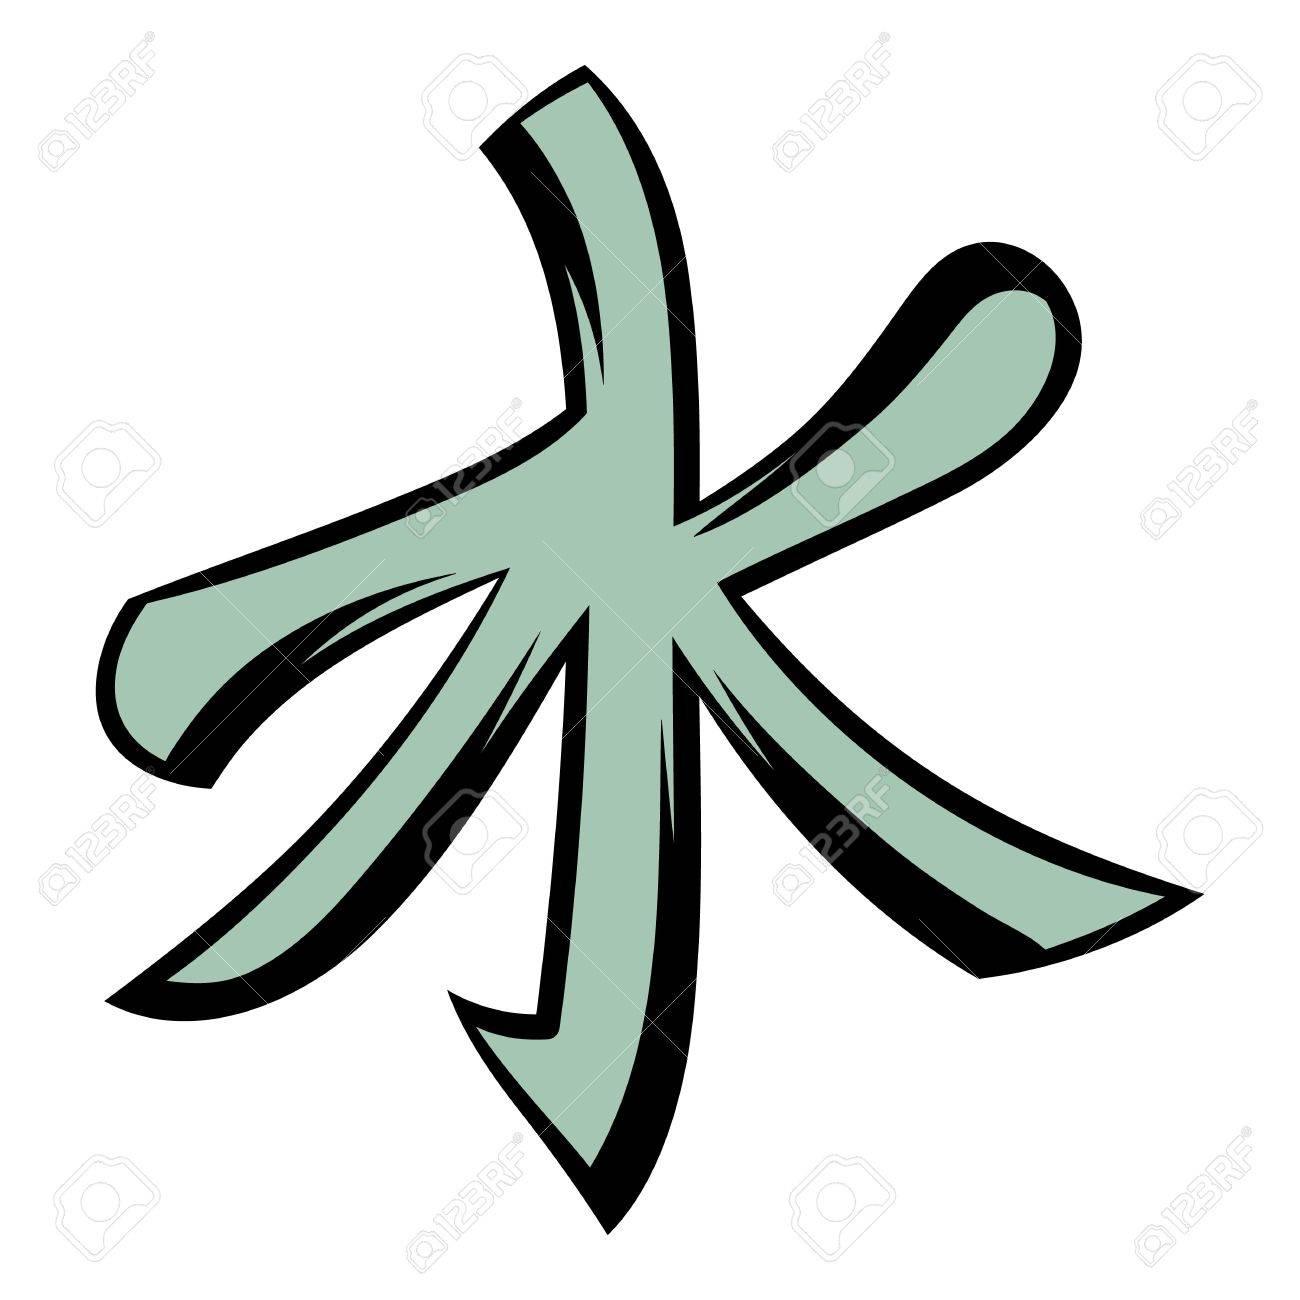 Confucianism icon cartoon royalty free cliparts vectors and confucianism icon cartoon stock vector 73526270 biocorpaavc Images